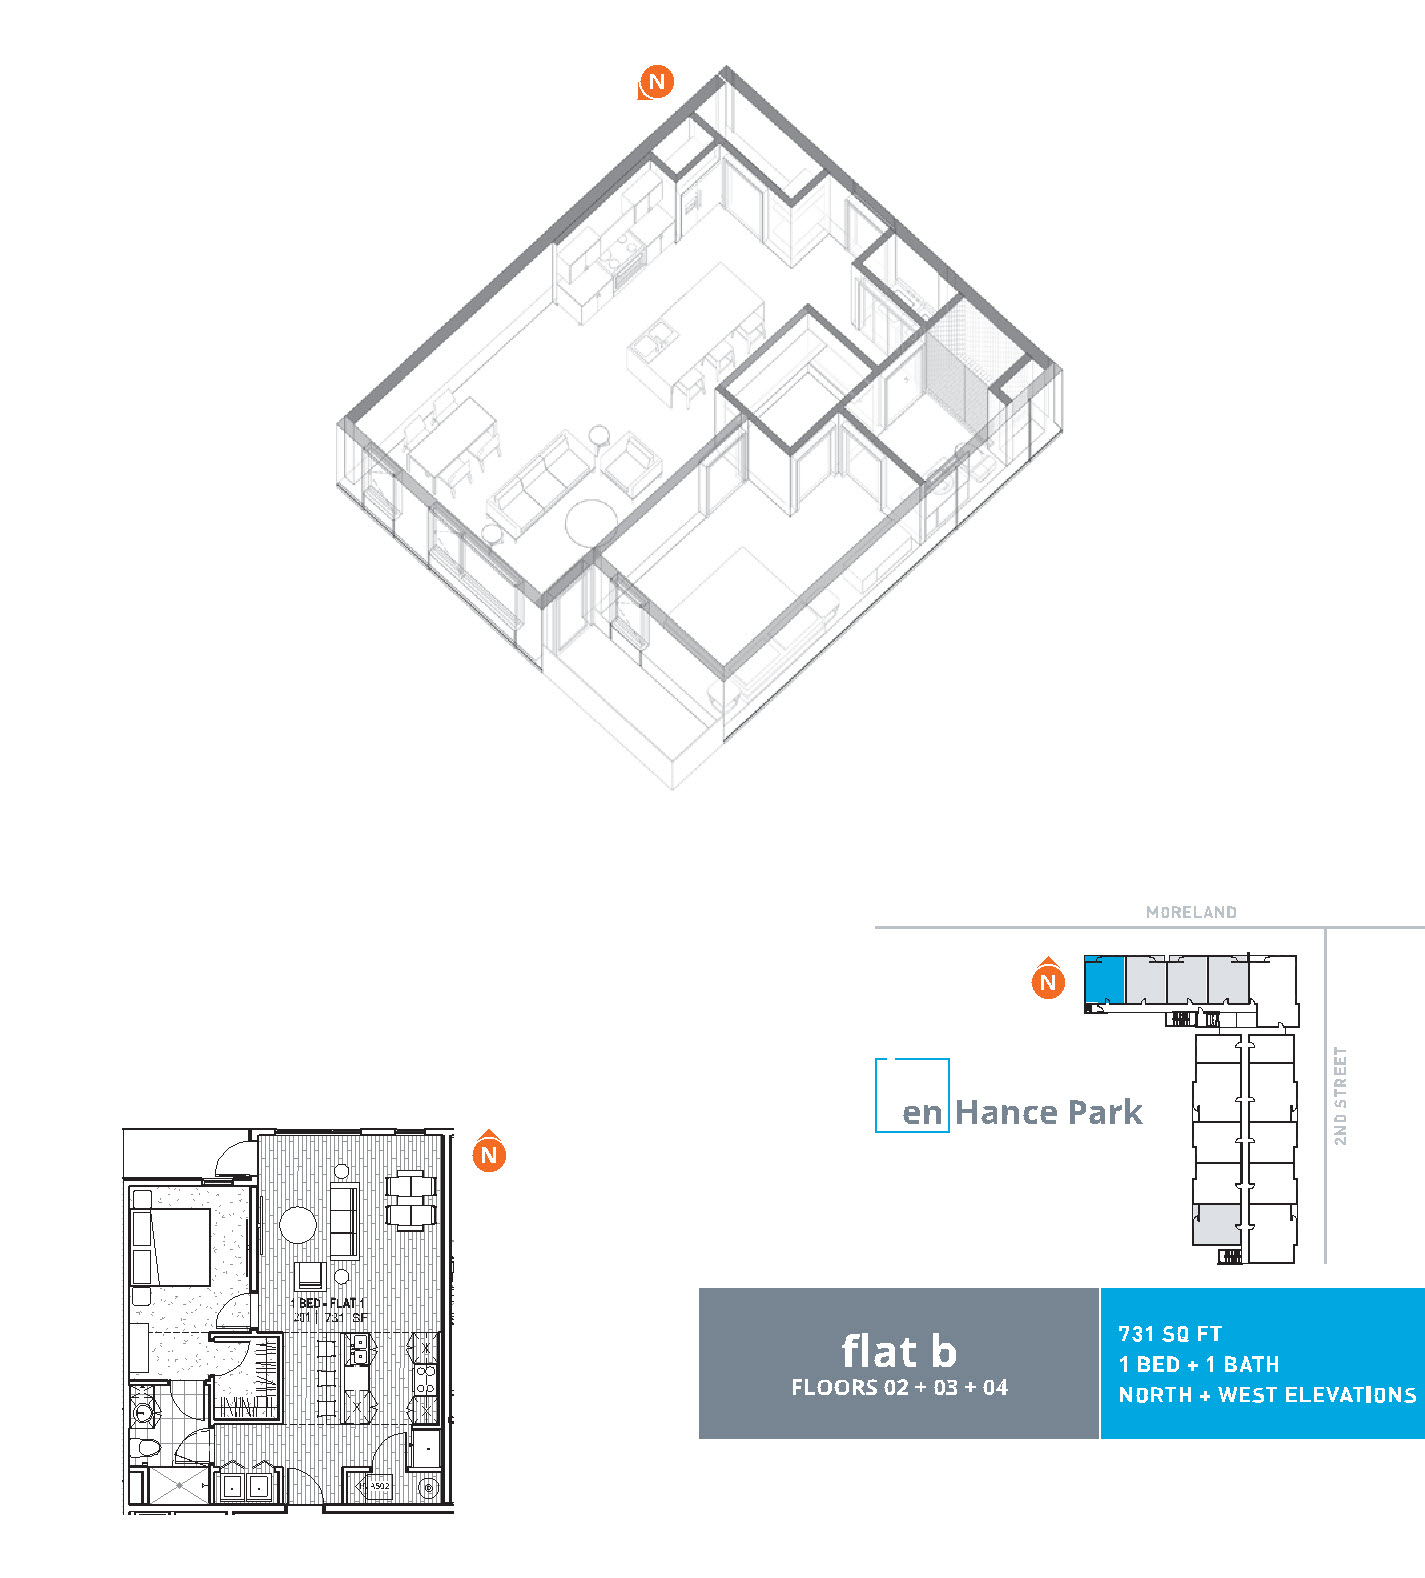 En hance park condo floor plan flat b 1bd